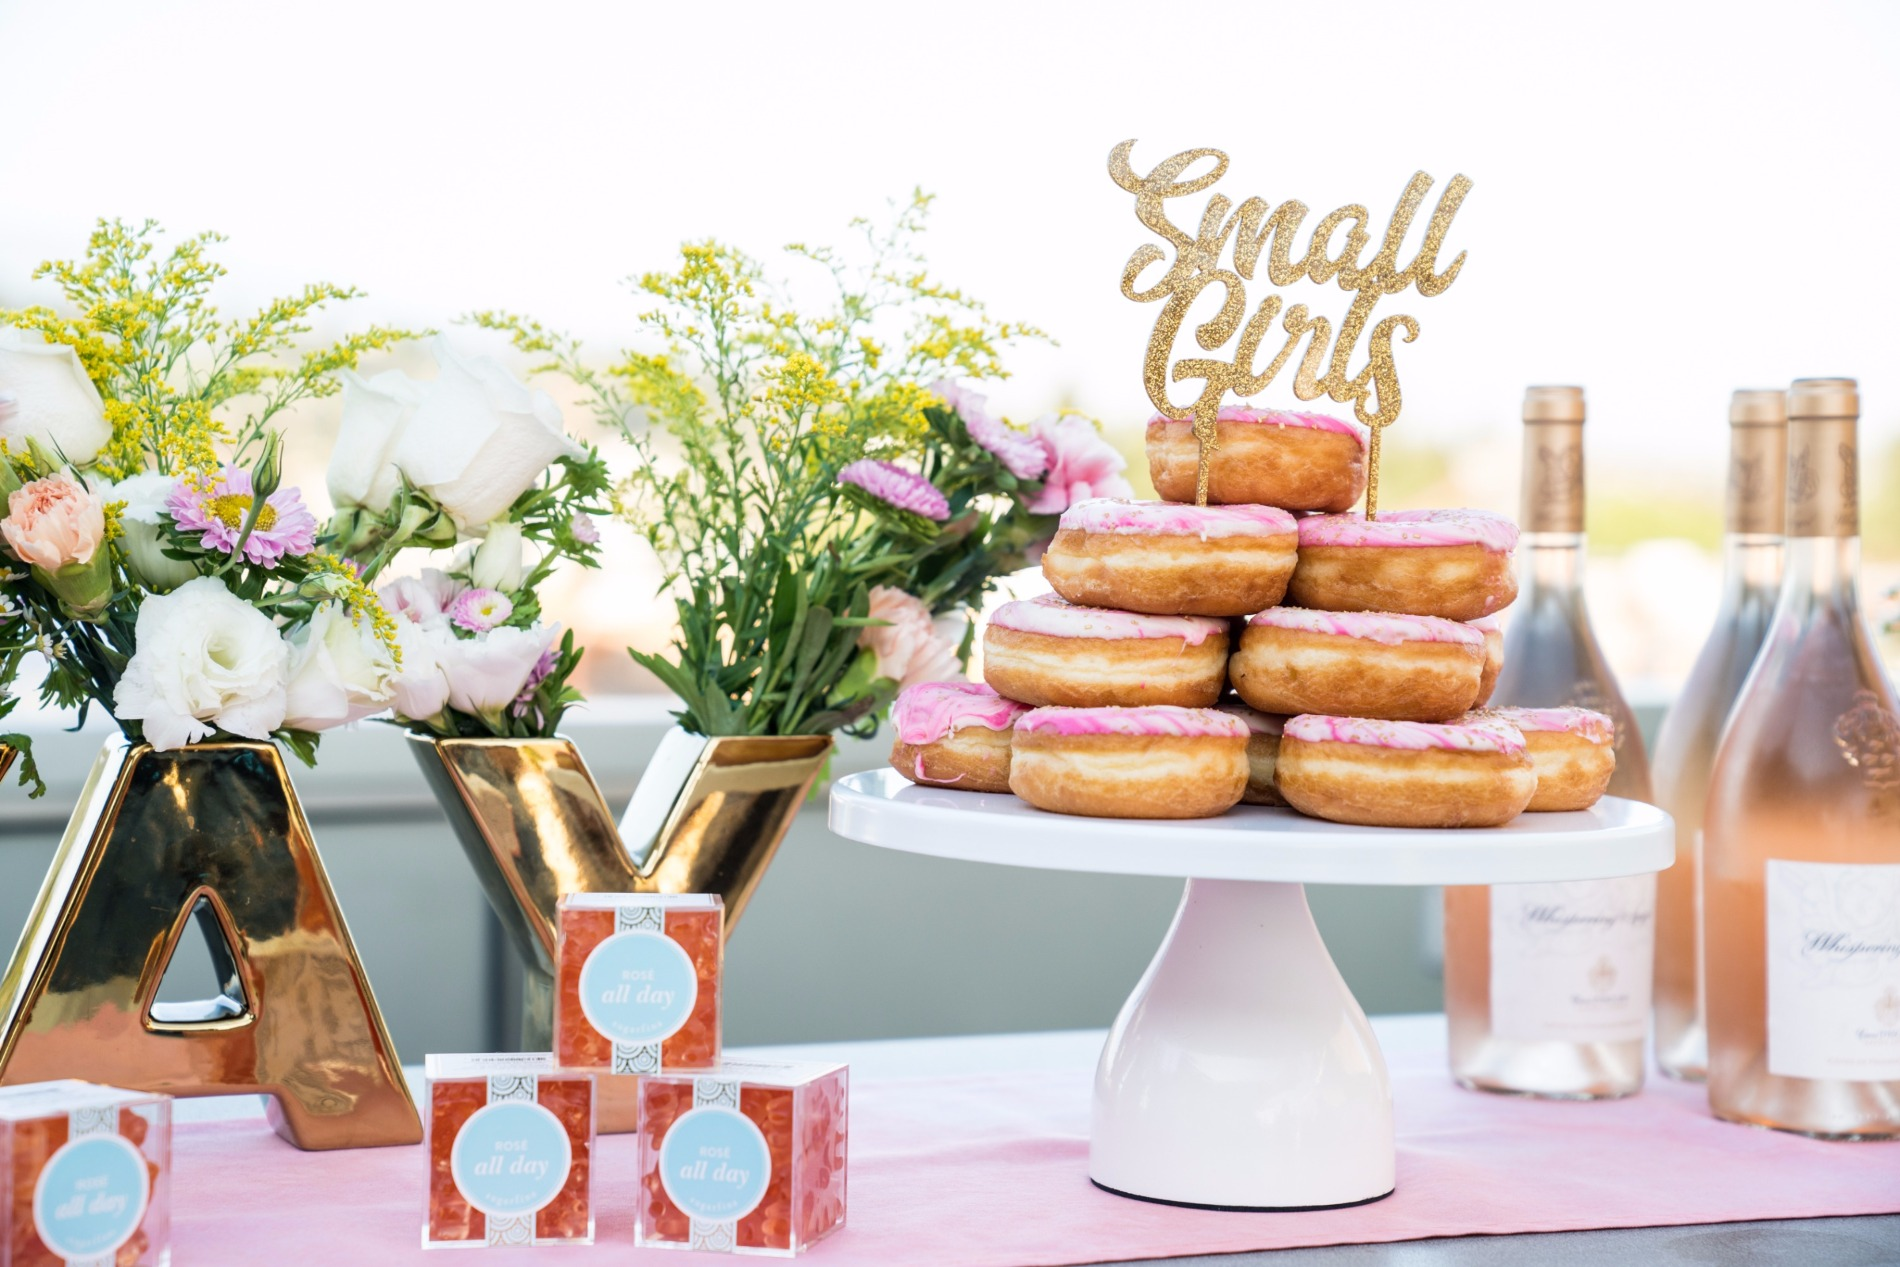 California Donuts | Sugarfina | Whispering Angel| Black Twine